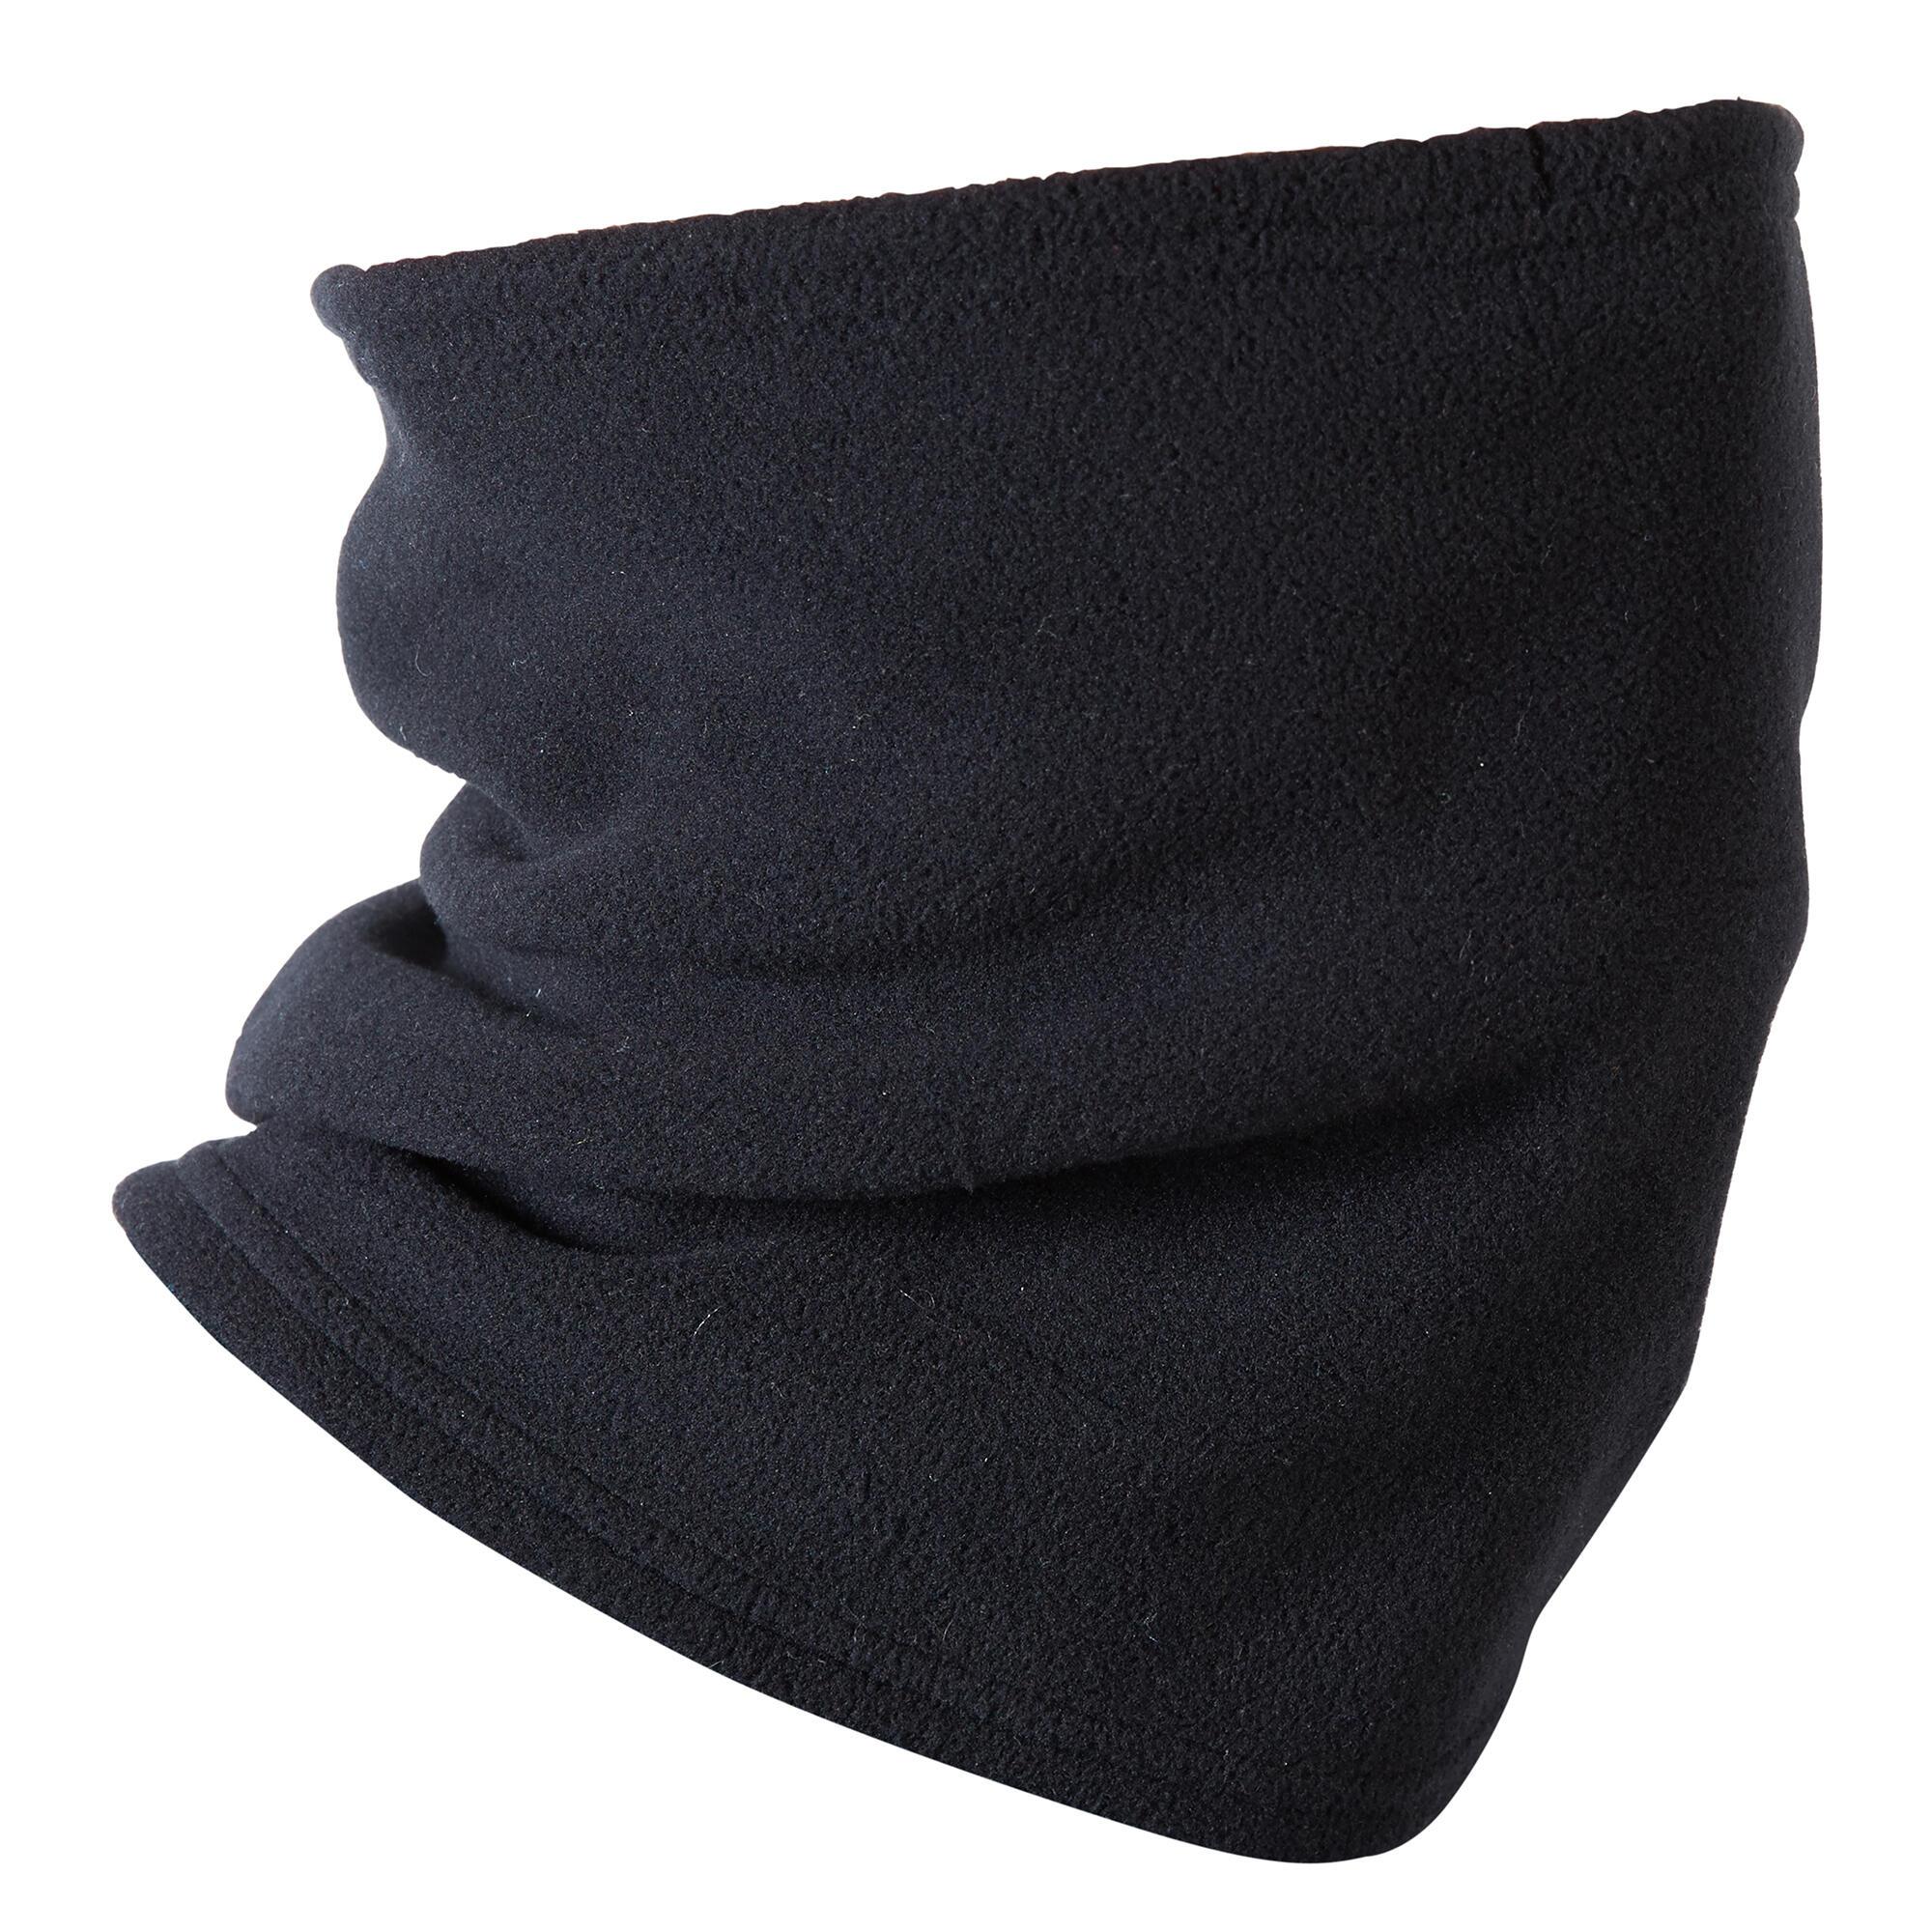 Schlauchtuch 100 Fleece schwarz | Accessoires > Schals & Tücher > Tücher | Van rysel